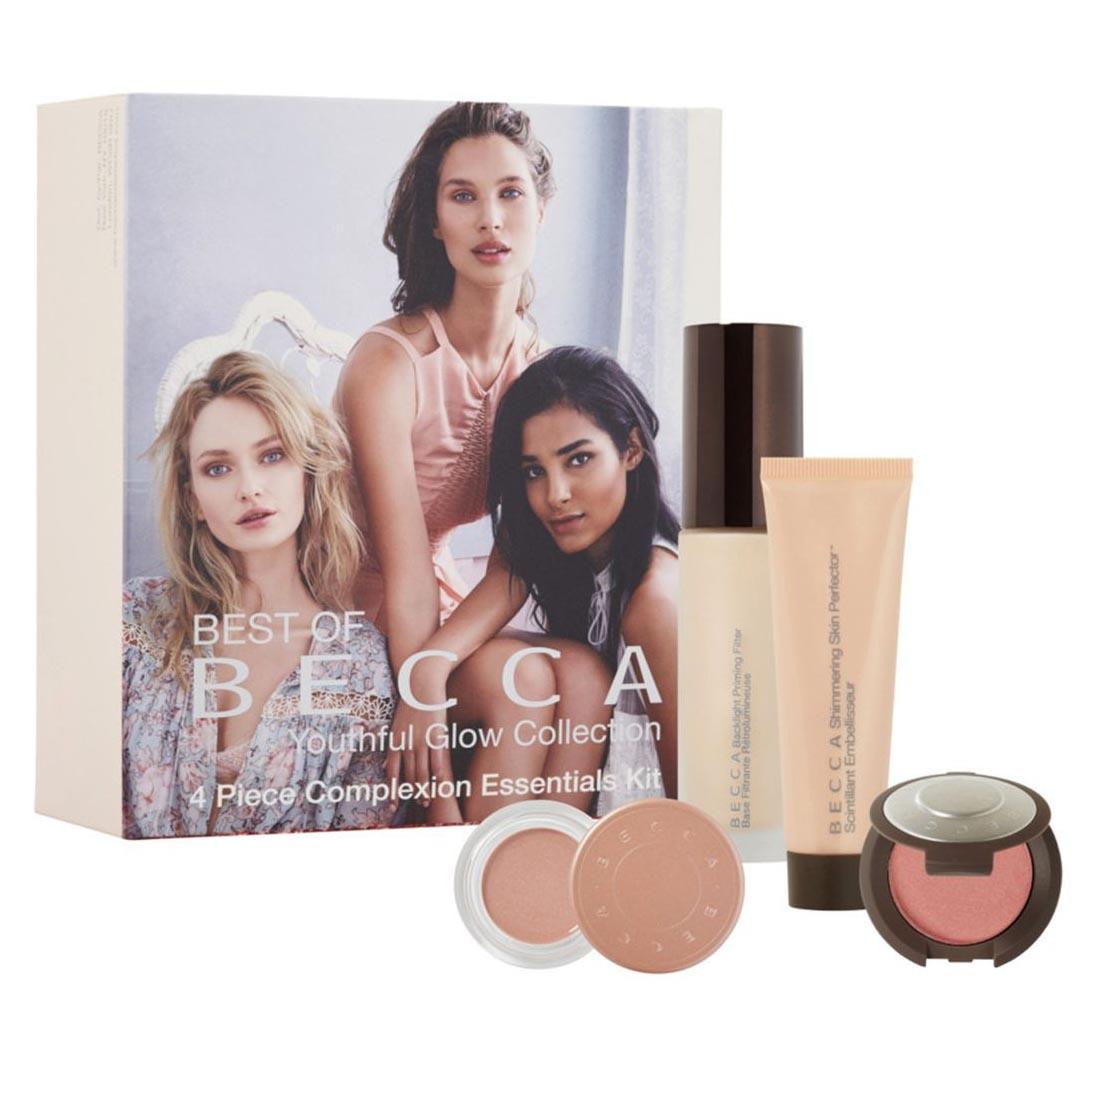 Best of BECCA Youthful Glow Kit